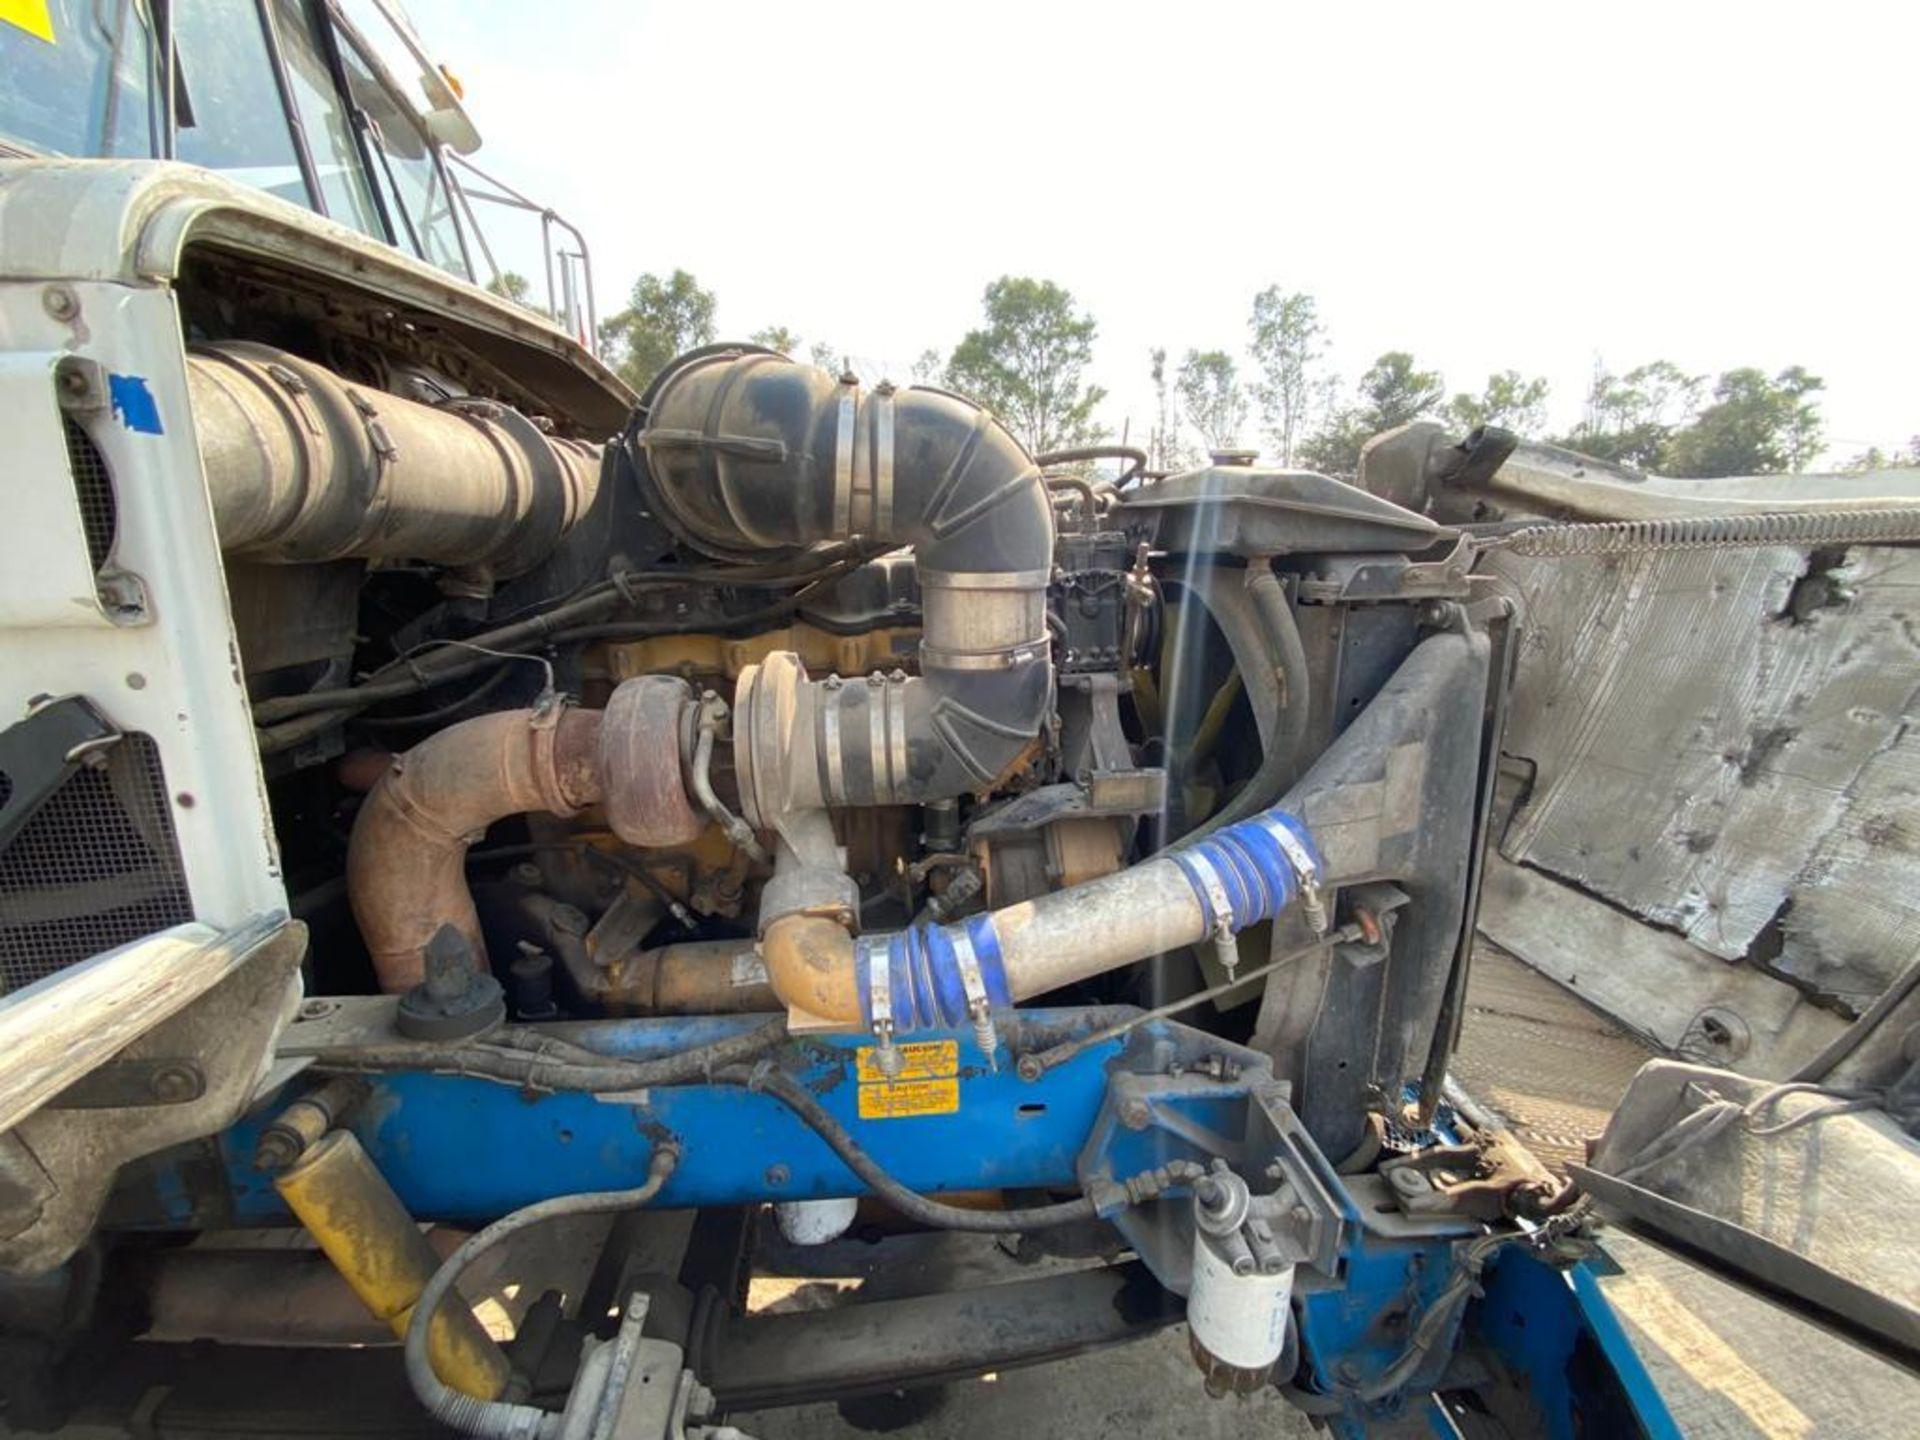 1999 Kenworth Sleeper truck tractor, standard transmission of 18 speeds - Image 71 of 75